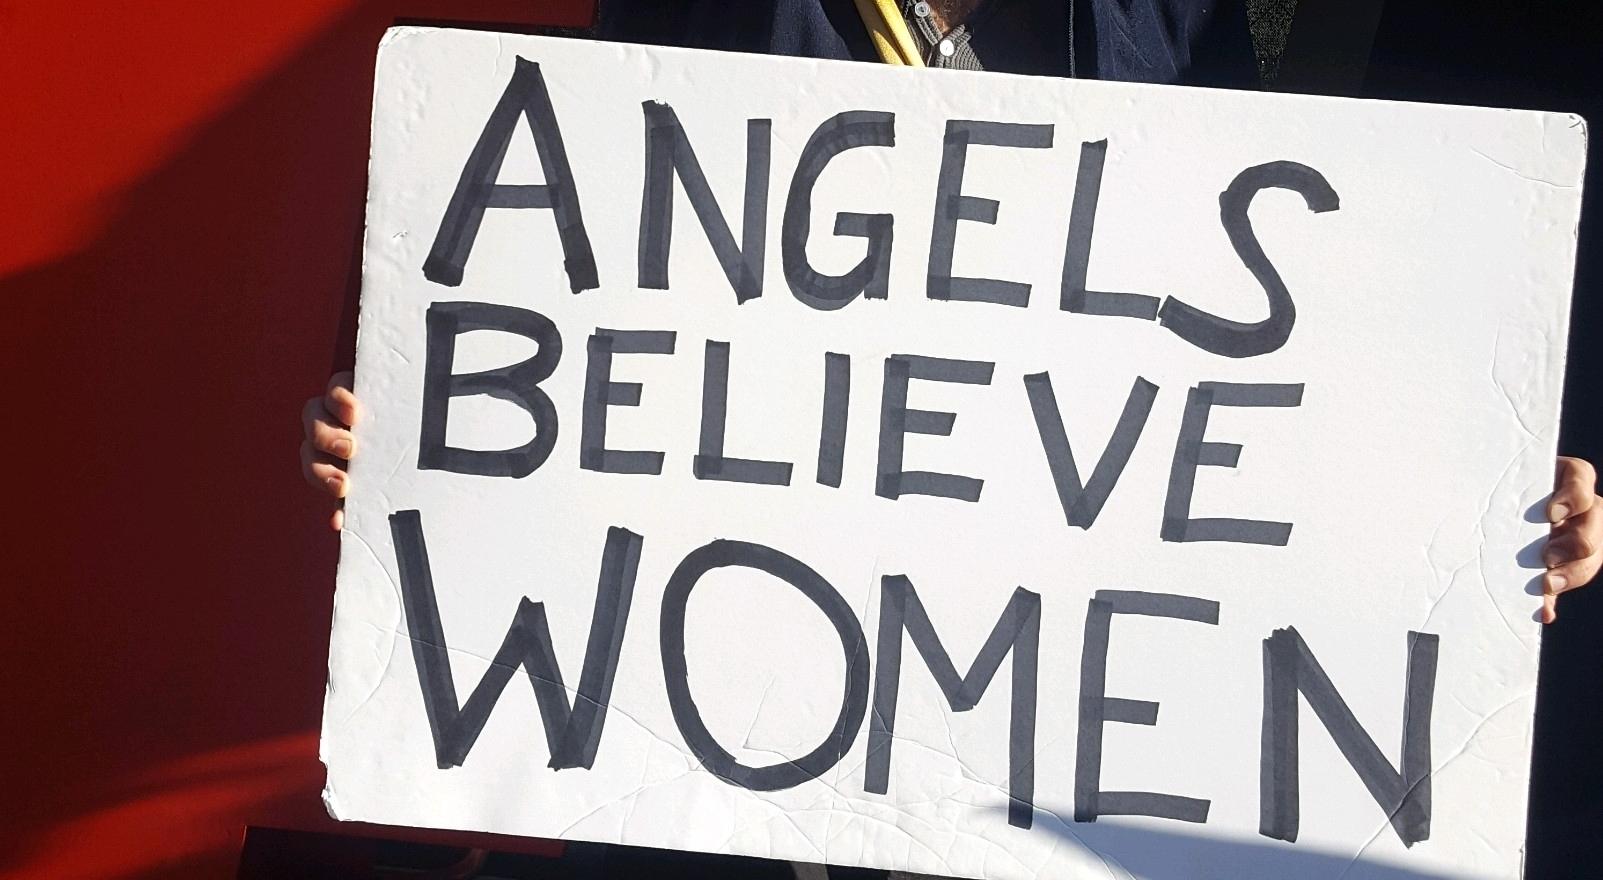 Angels believe in women. Scenes from The 2018 Women's March Los Angeles, California.